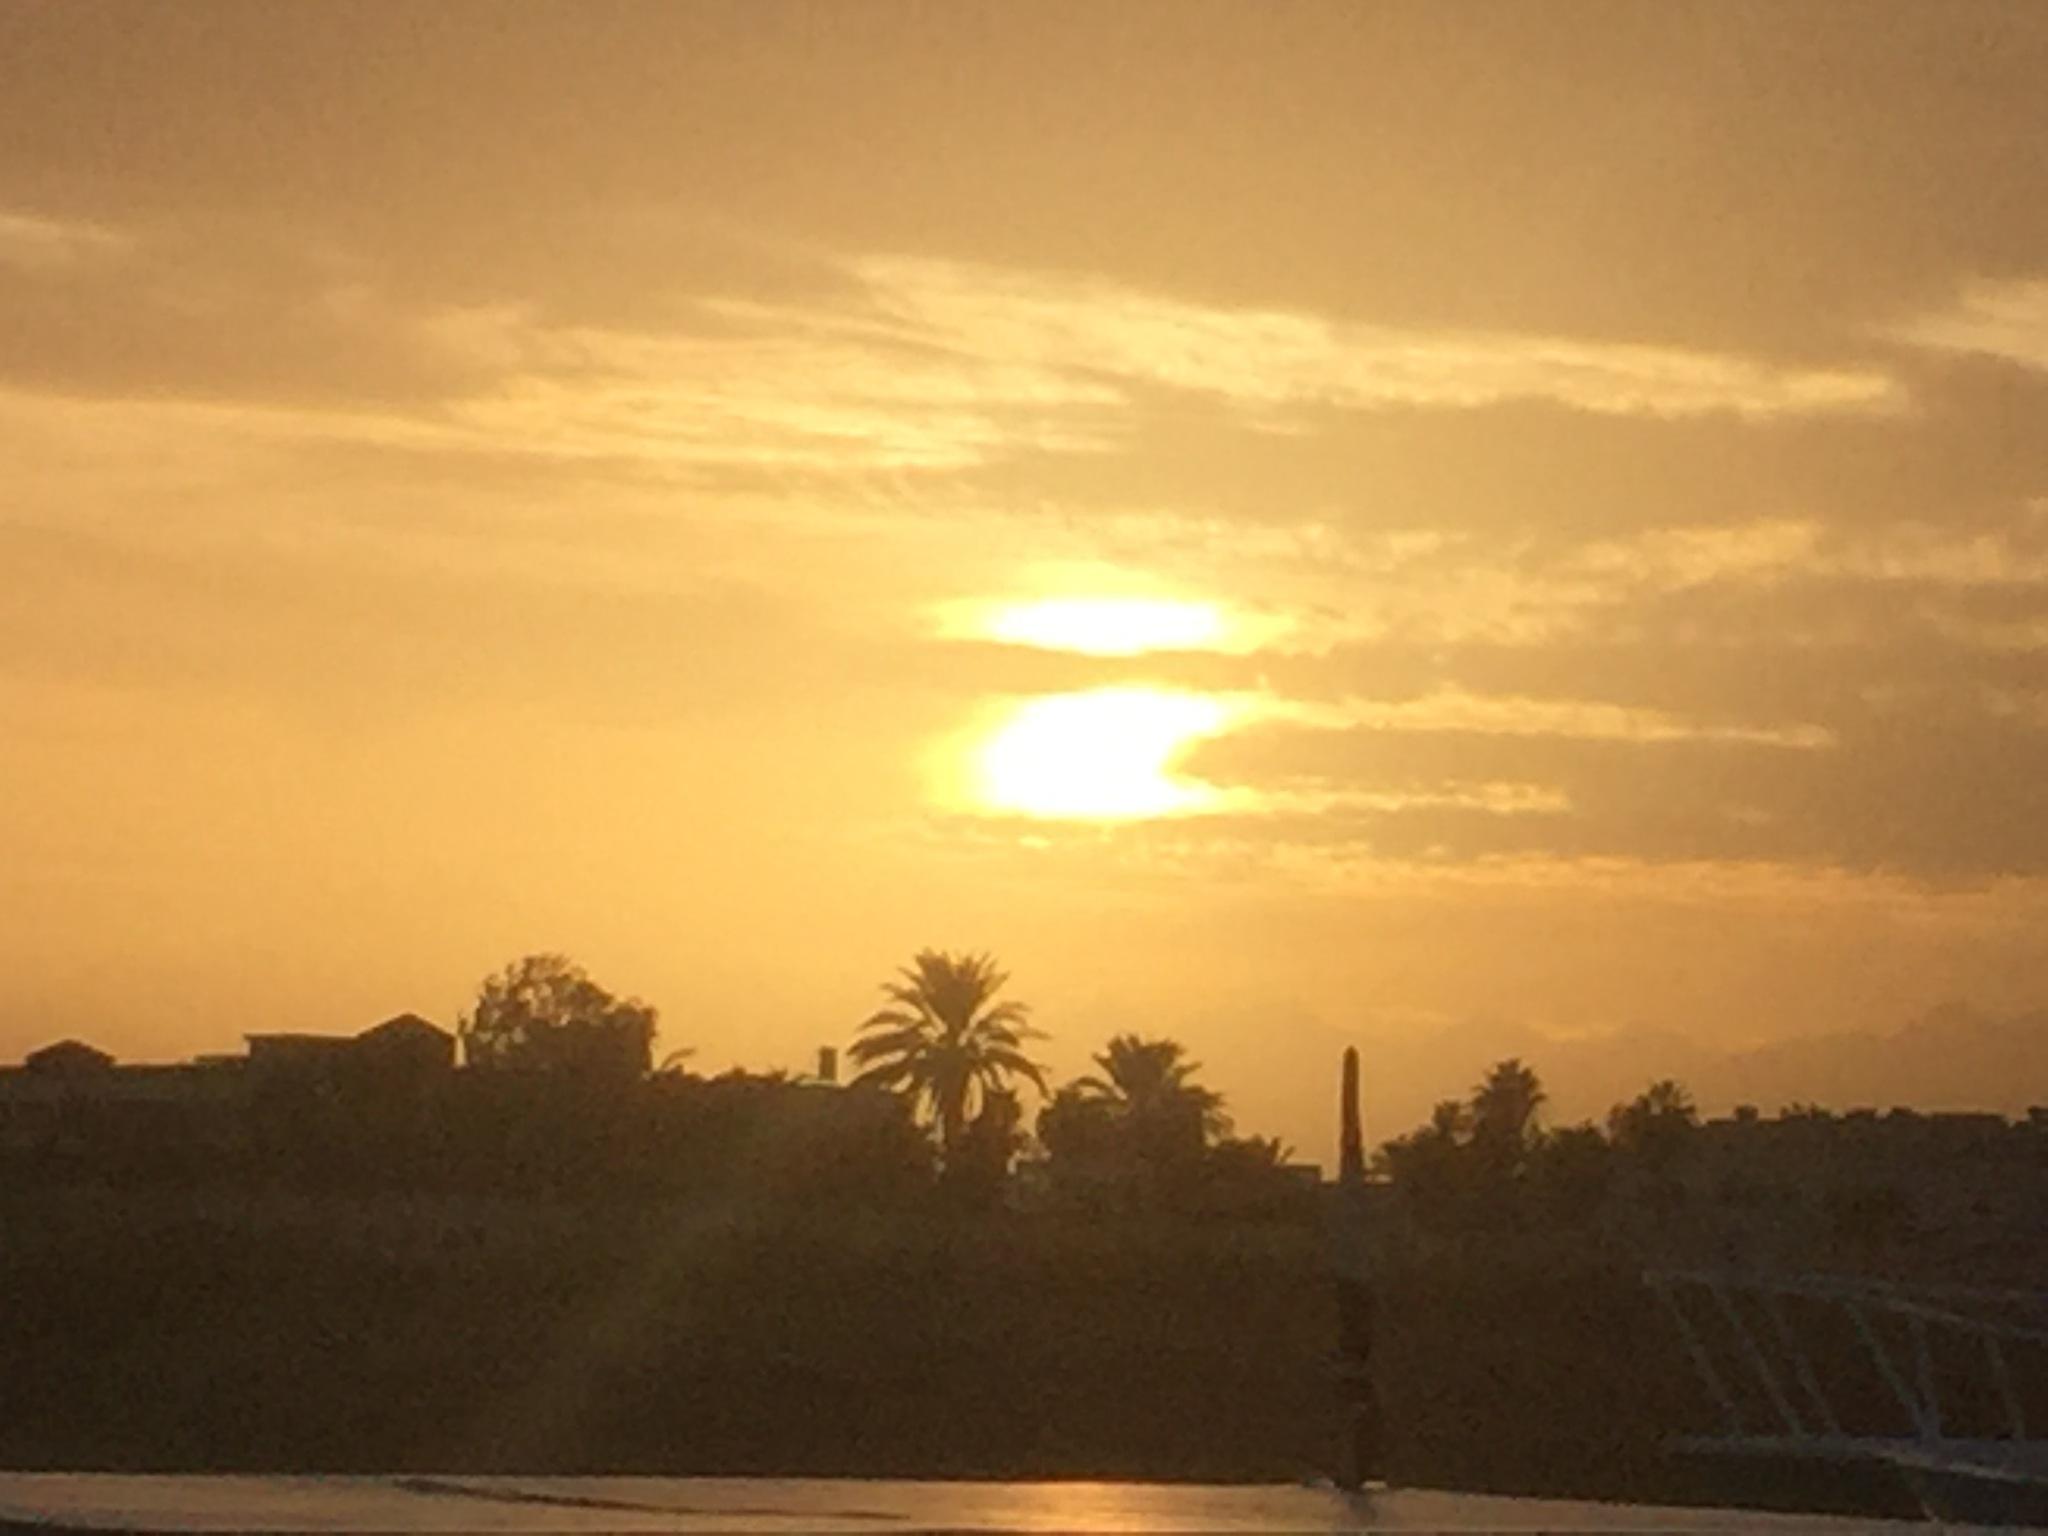 Sonnenuntergang in Hurghada  by Daniel schaefer